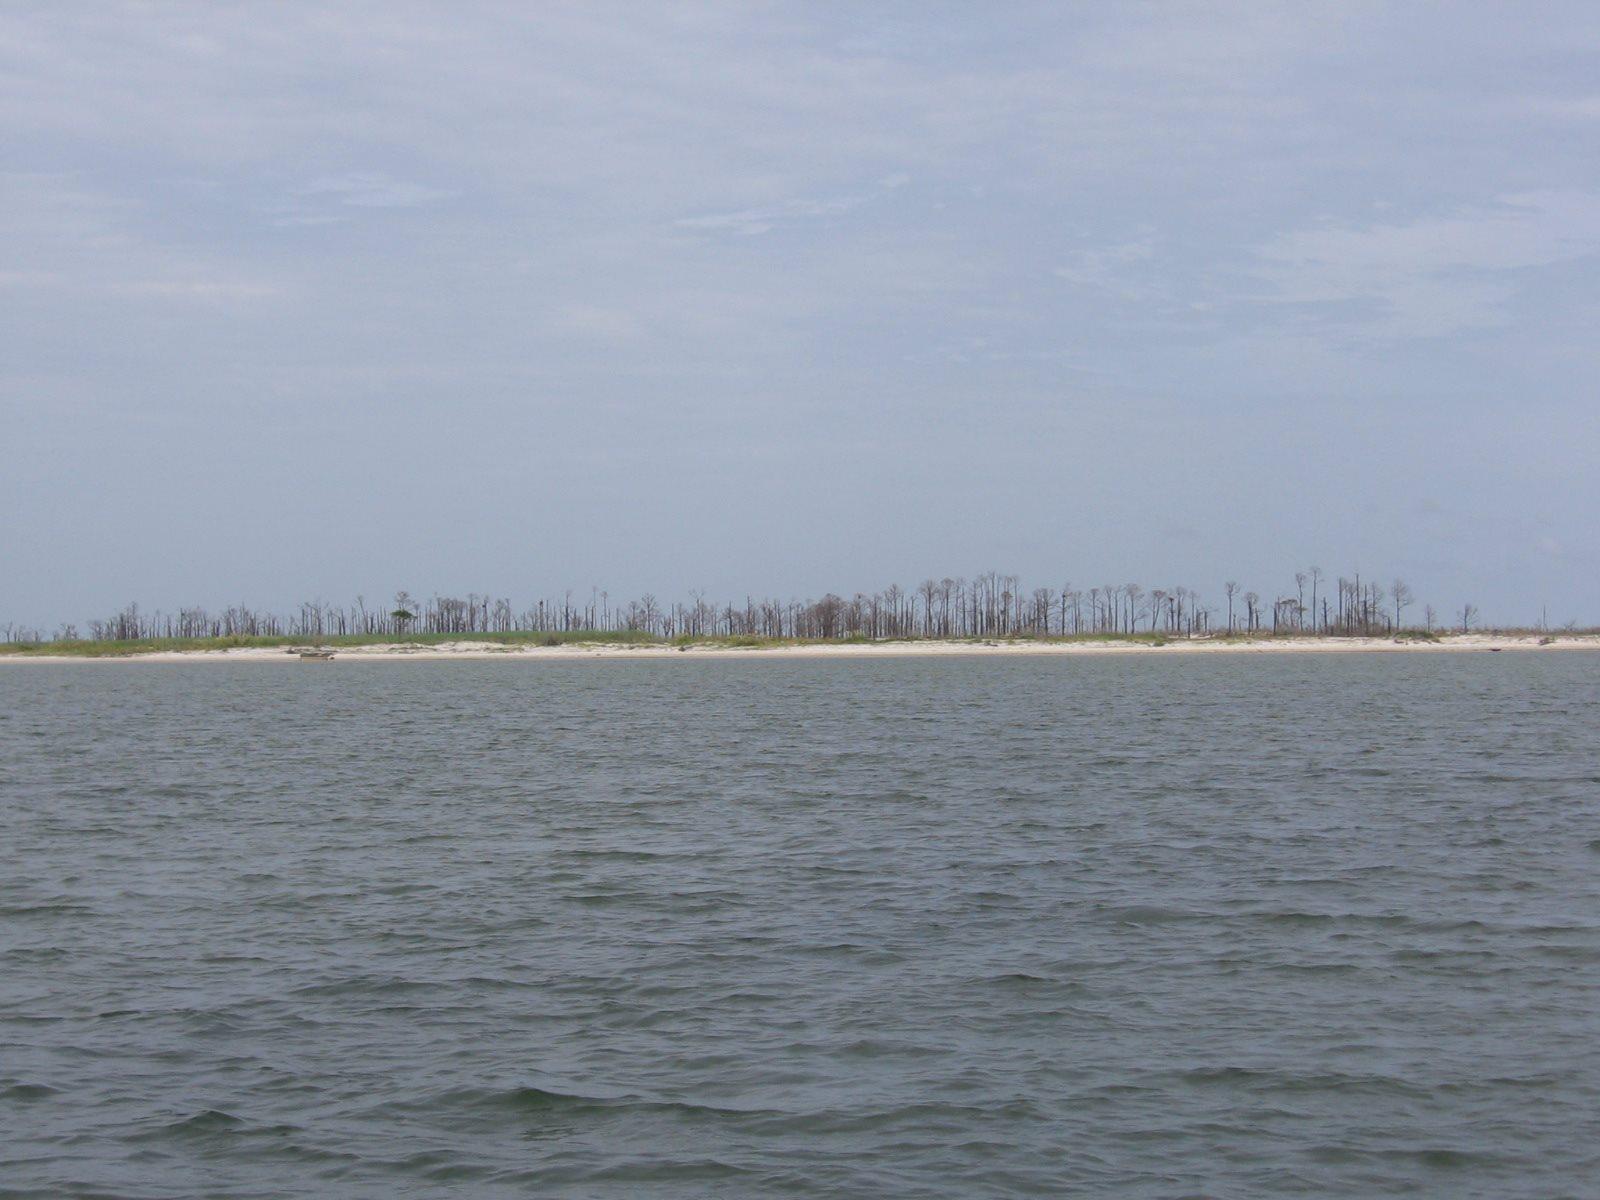 Petit Bois Island